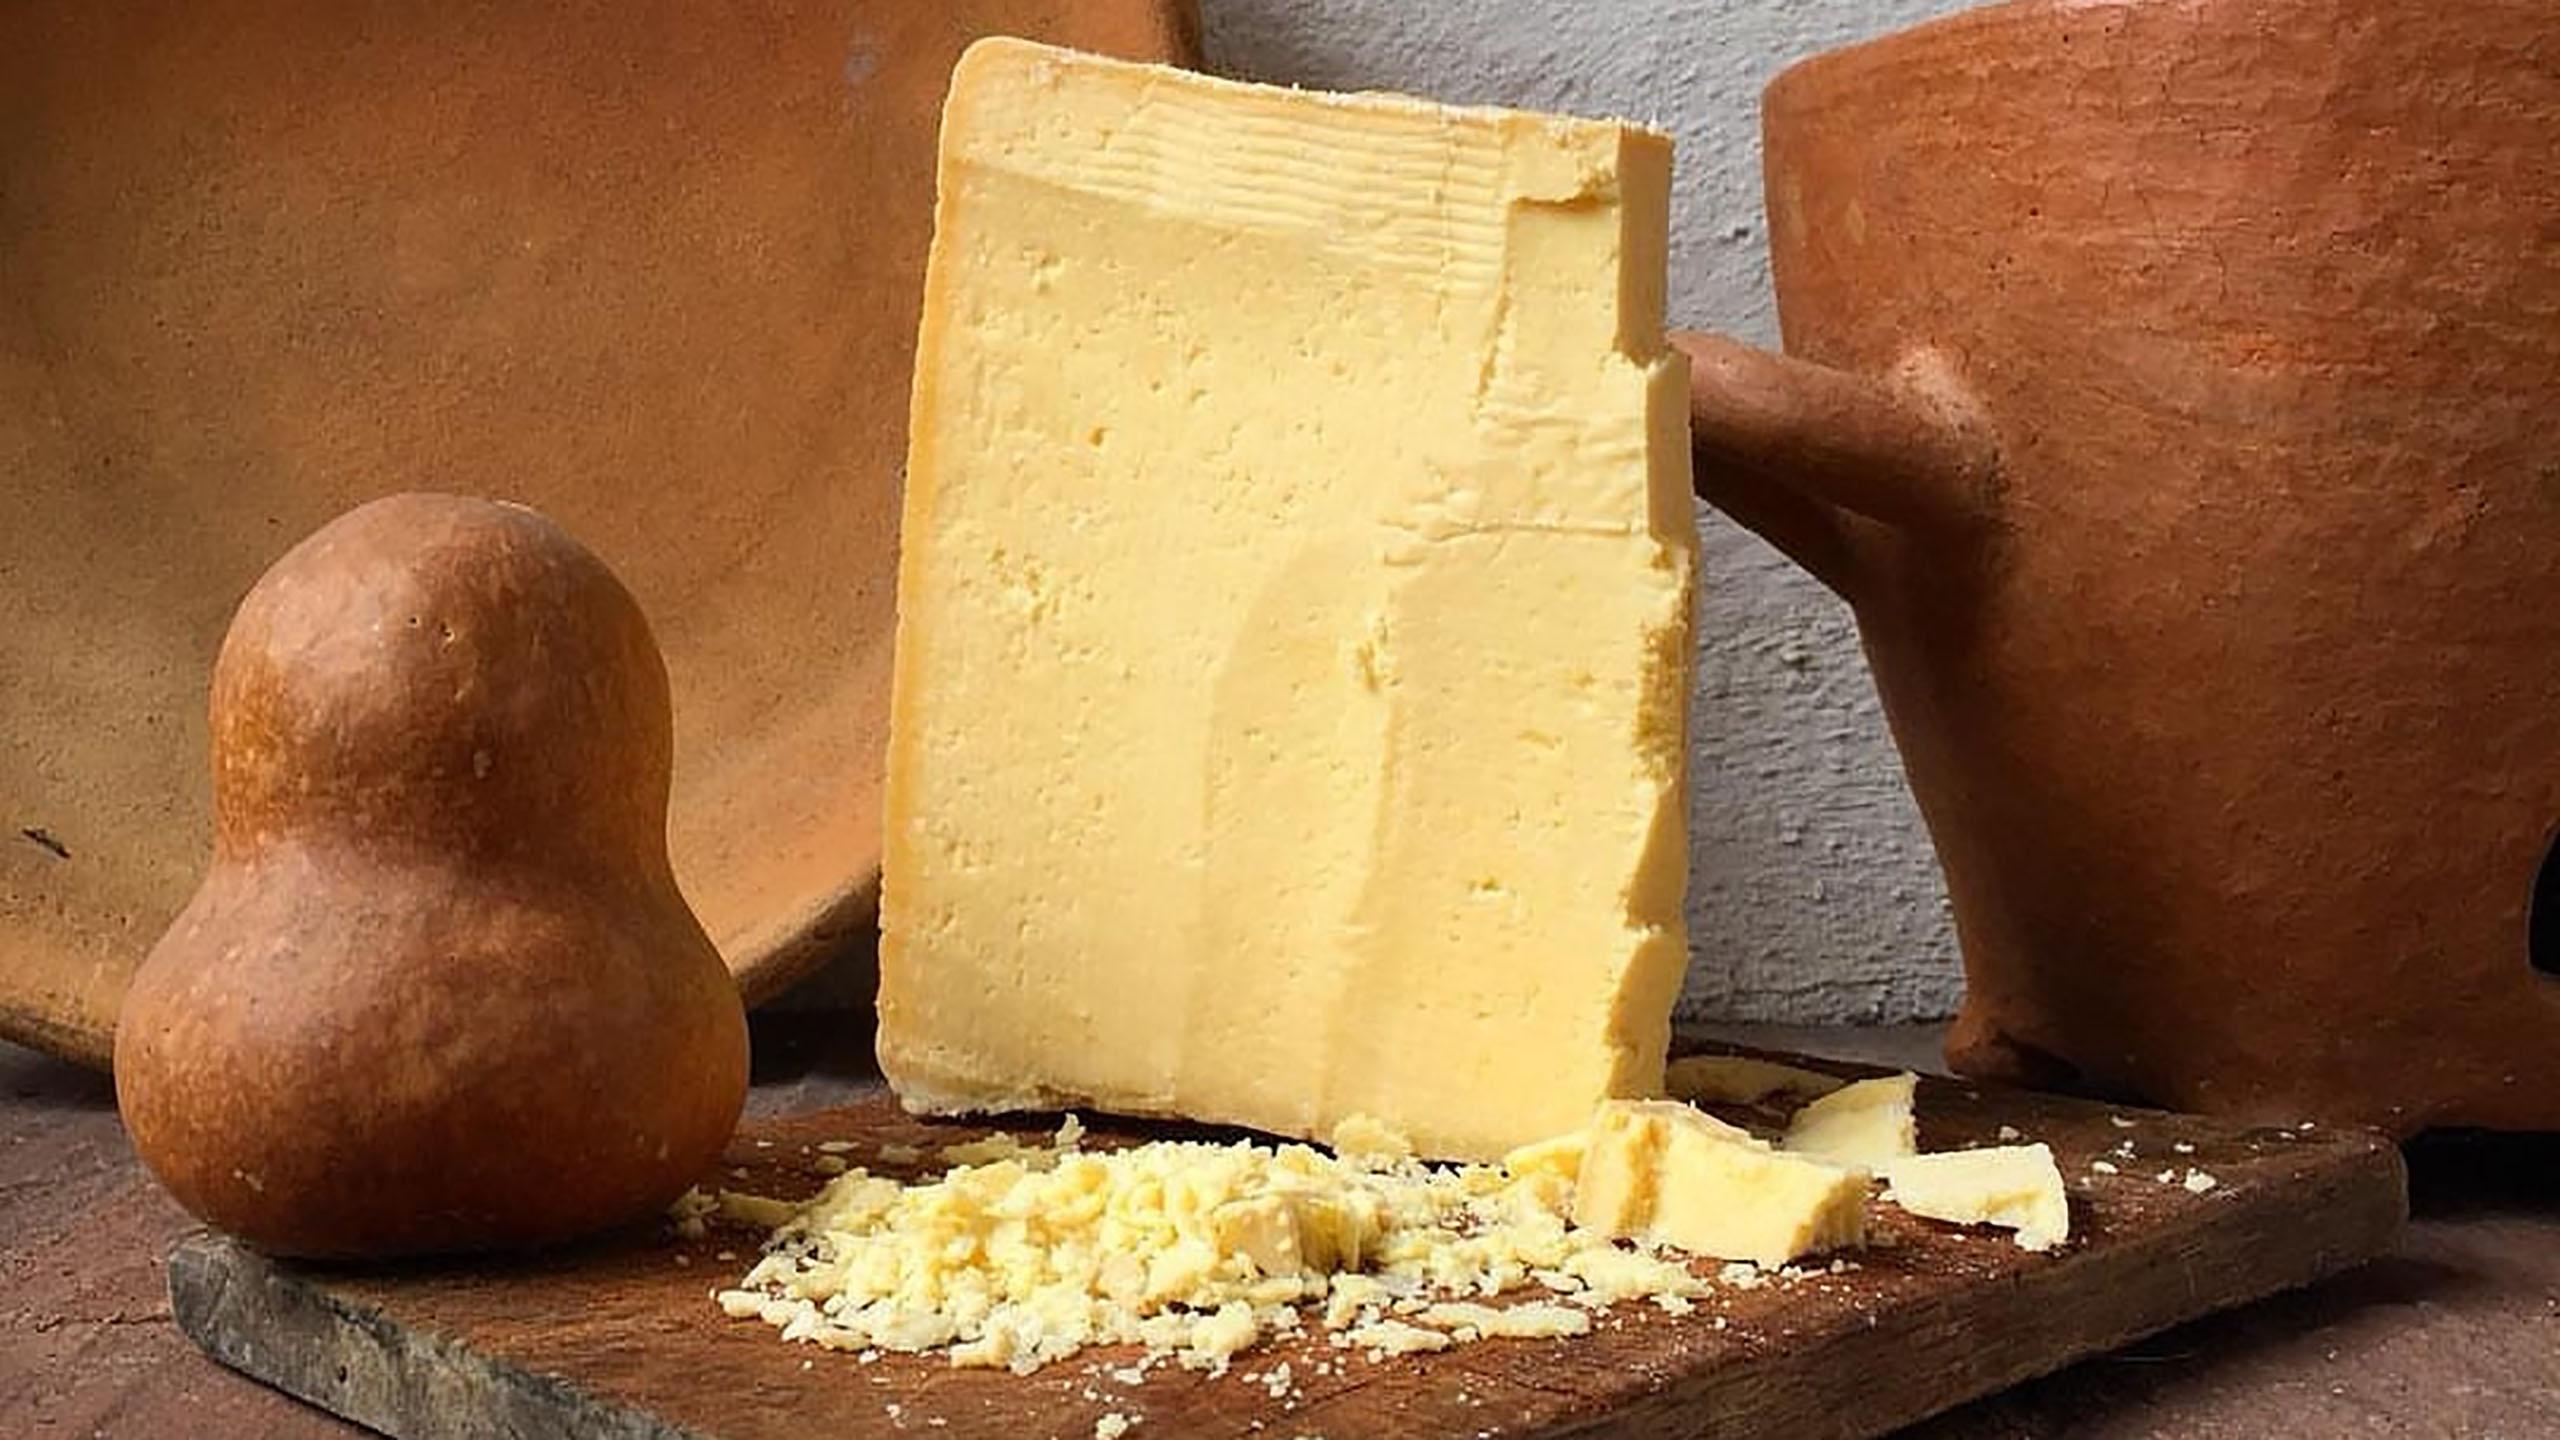 queso, quesos mexicanos, queso cotija